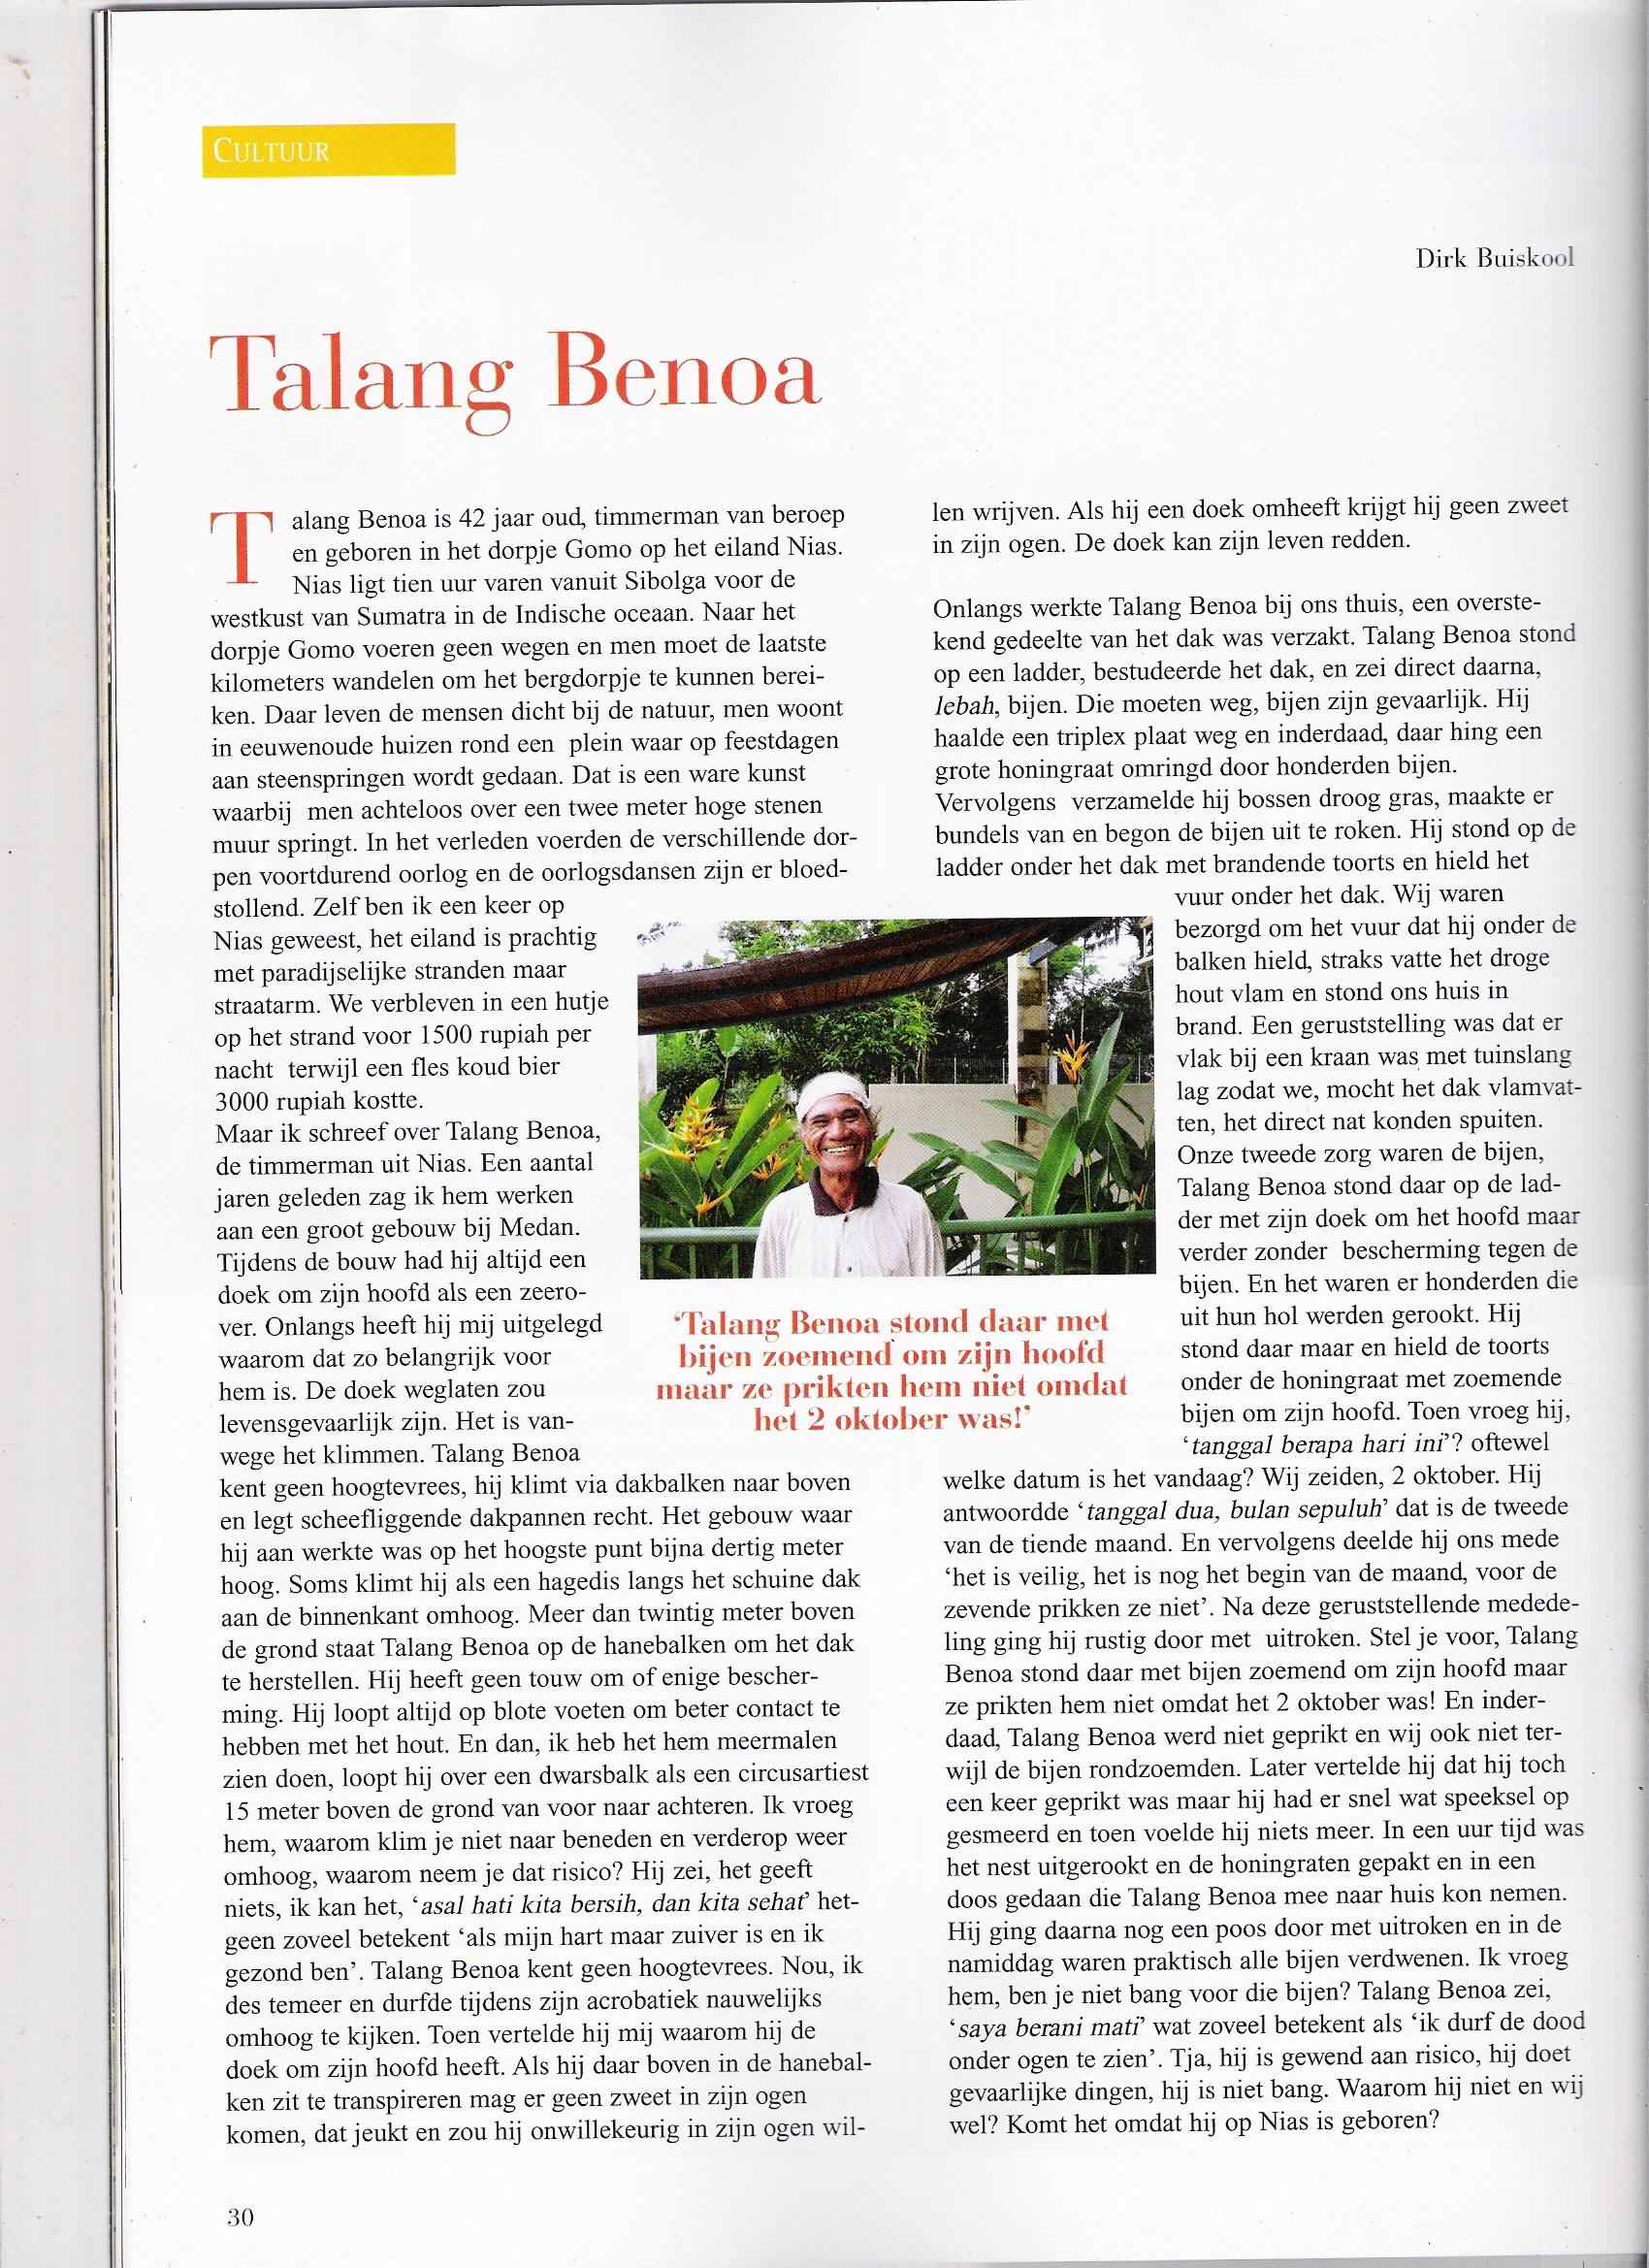 Talang Benoa - Talang Benoa